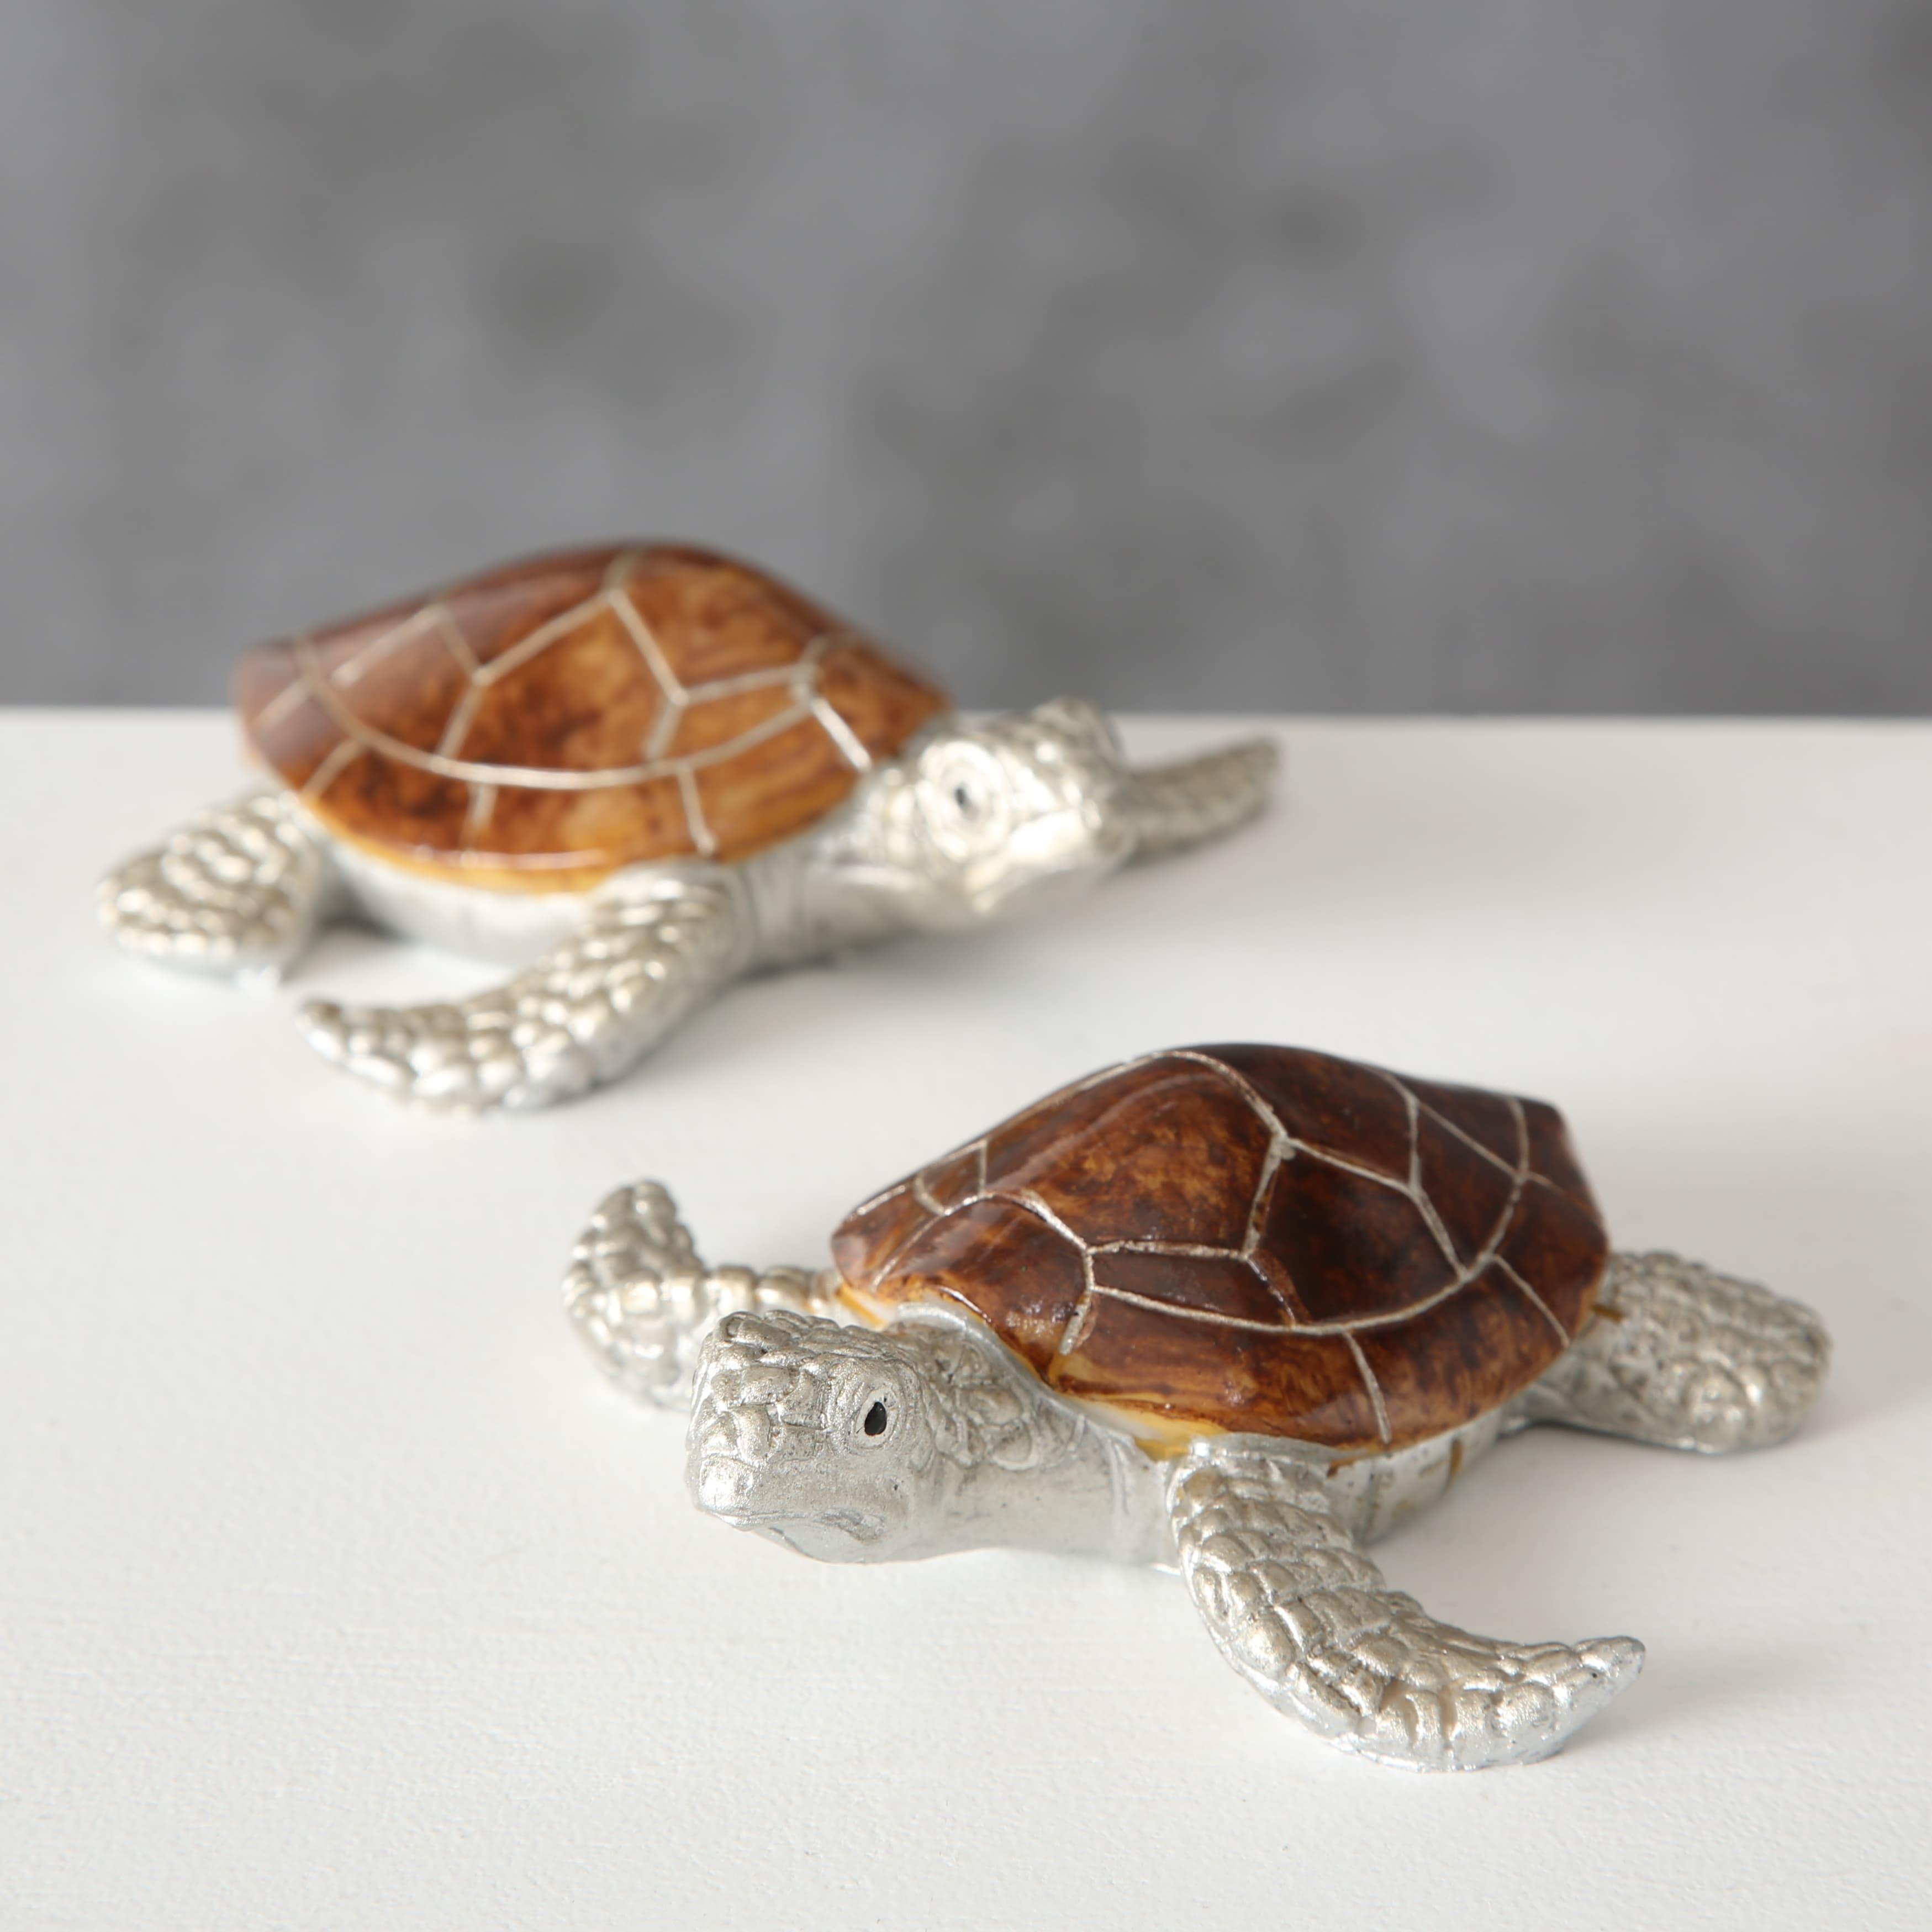 Decoratiune din polirasina Bijan Turtle Argintiu / Maro, Modele Asortate, l11xA11xH4 cm poza